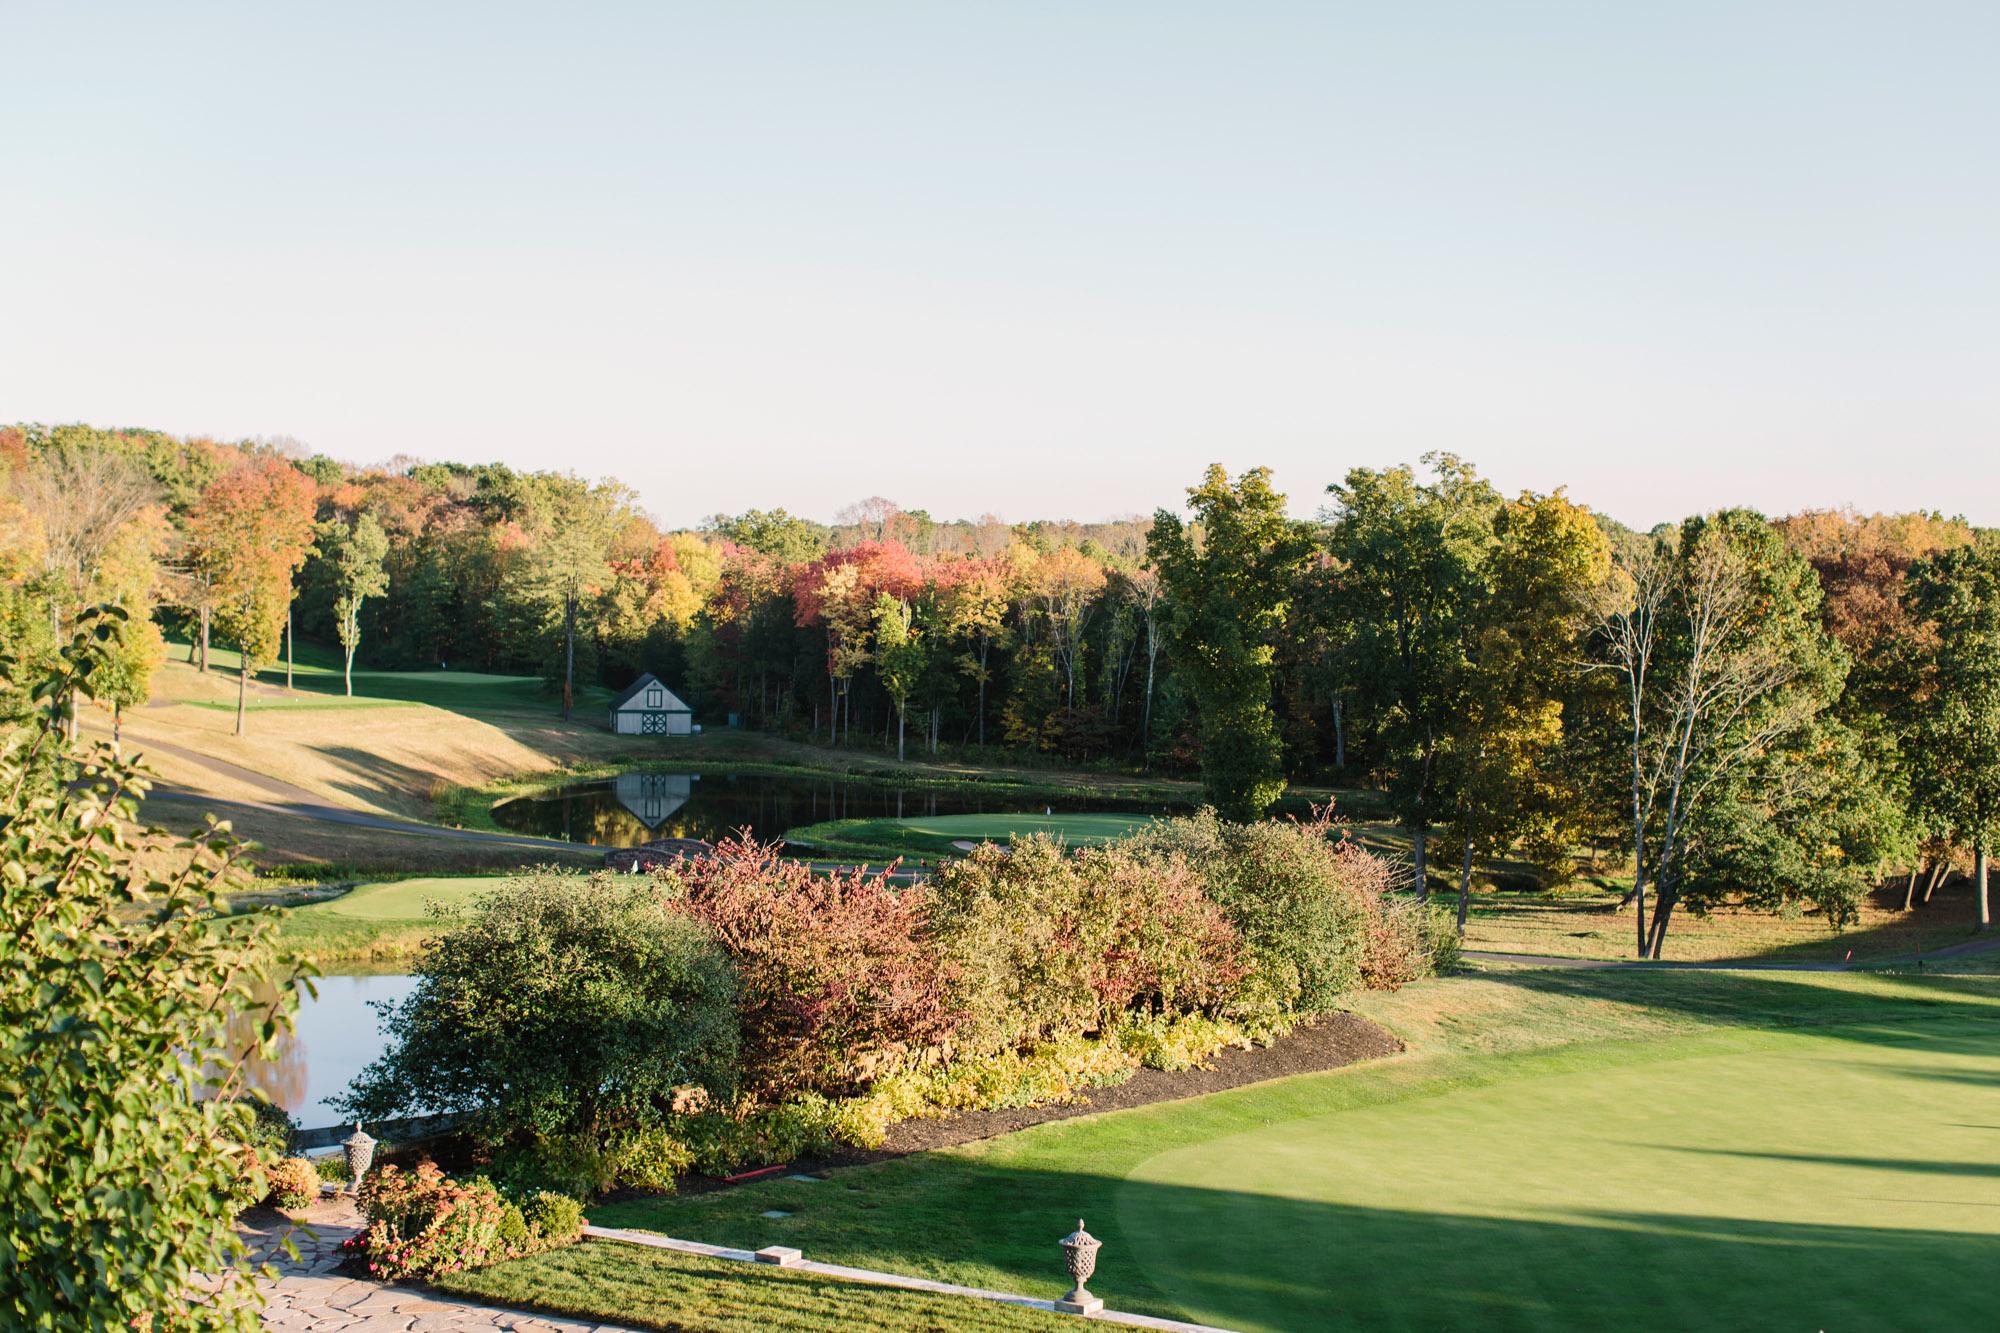 50_Christina_Daniel_Hamilton_Farm_Golf_Club_Wedding_NJ_Tanya_Salazar_Photography_1275.jpg